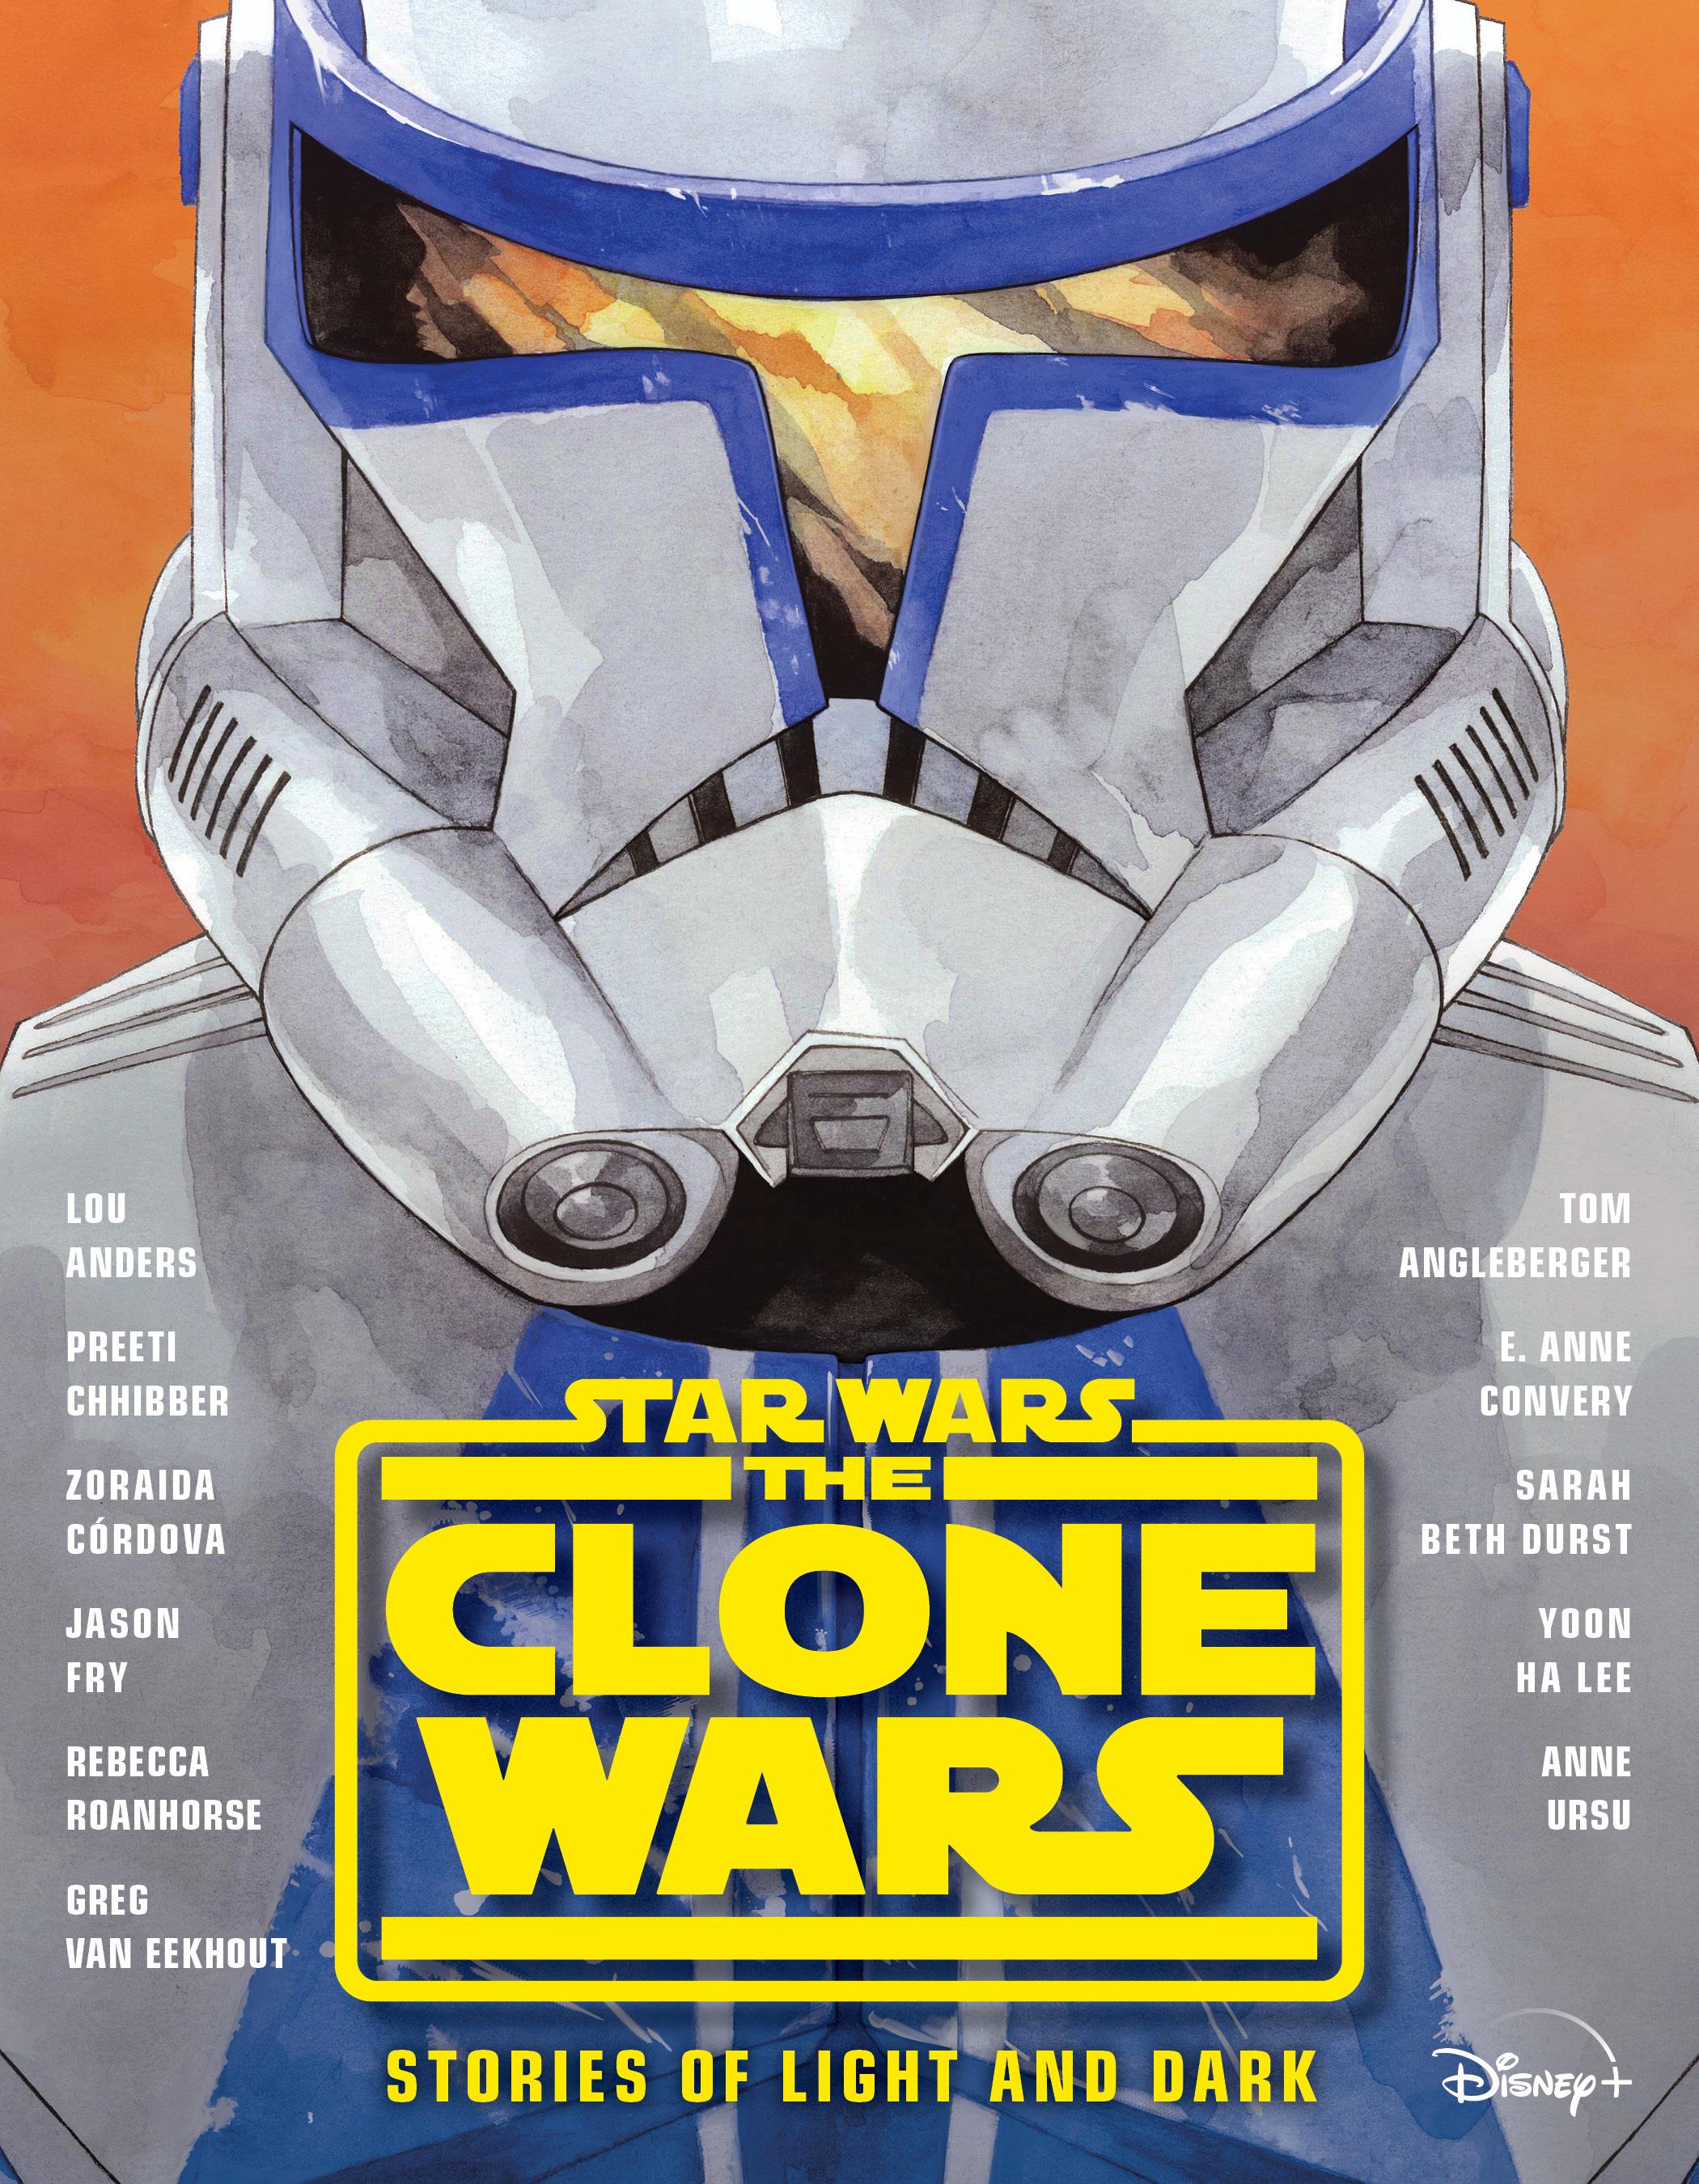 Star Wars: The Clone Wars – Stories of Light and Dark